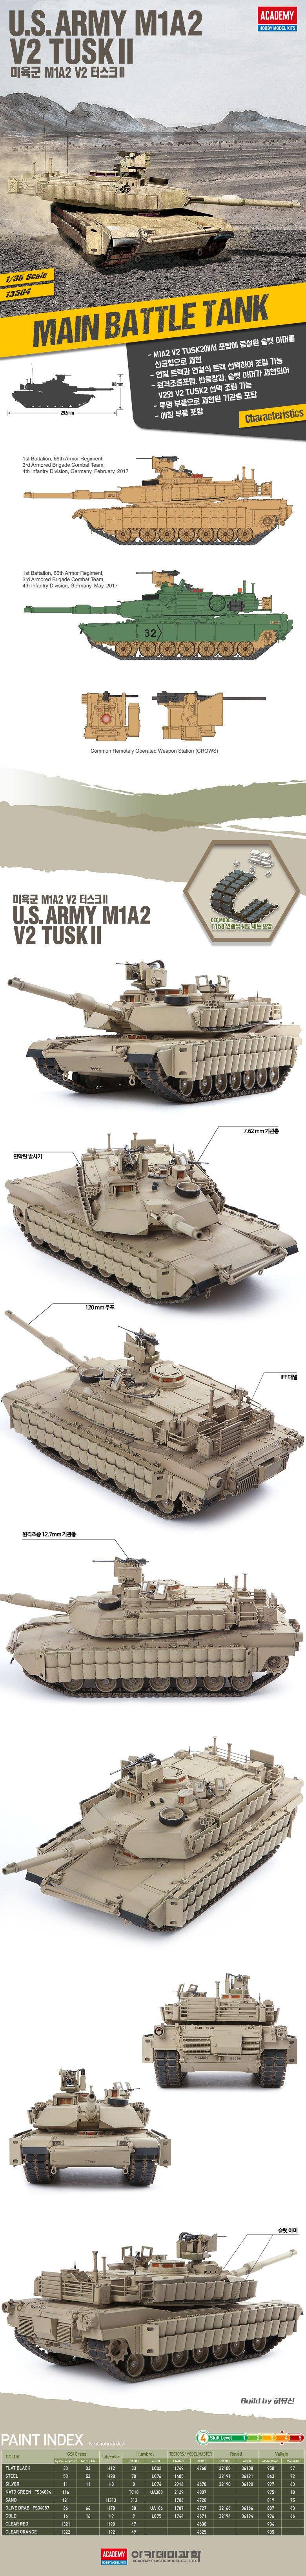 ACADEMY KIT # 13504  1-35 U.S Army M1A2 V2 TUSK II.JPG